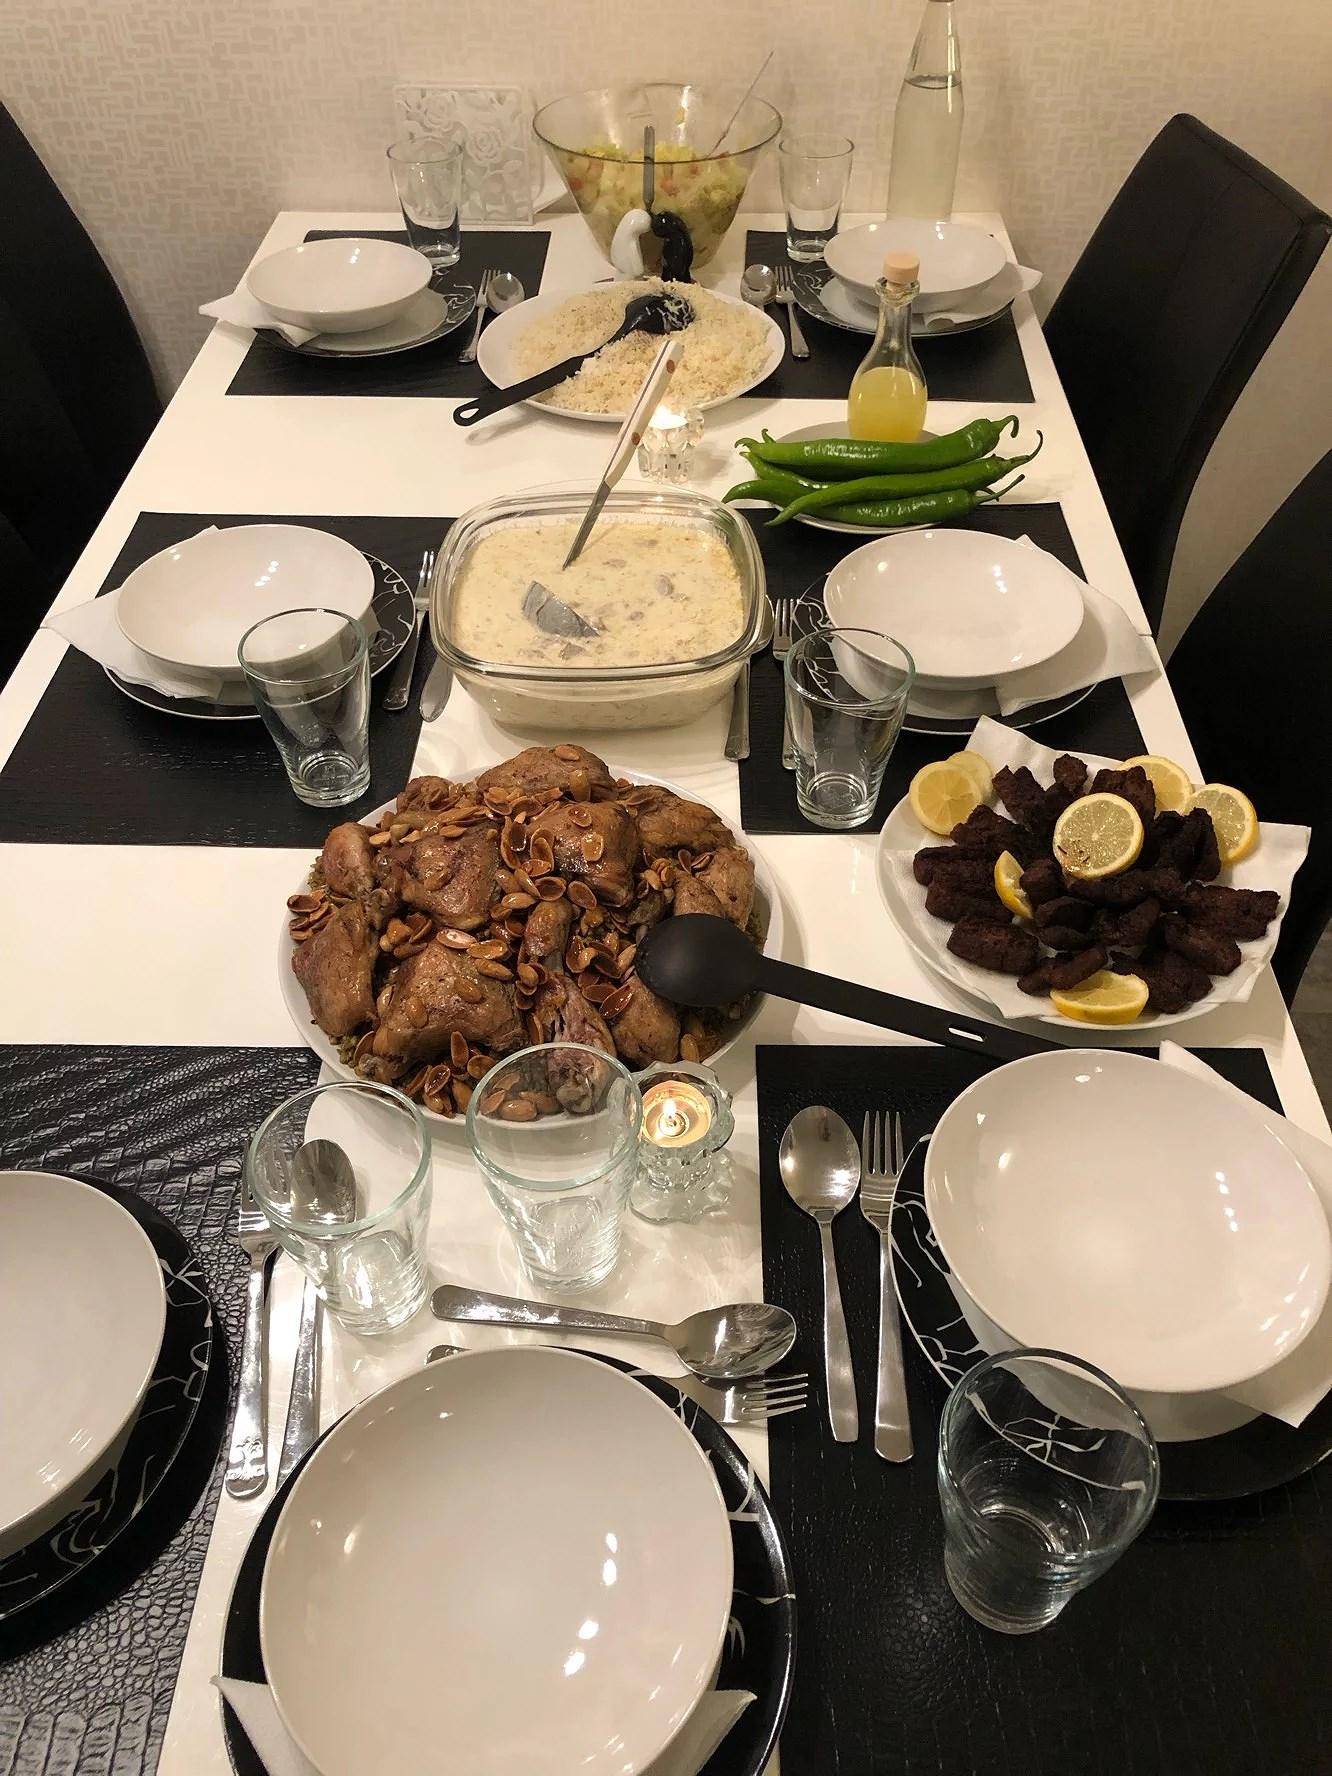 Trevlig middag i kväll 😊